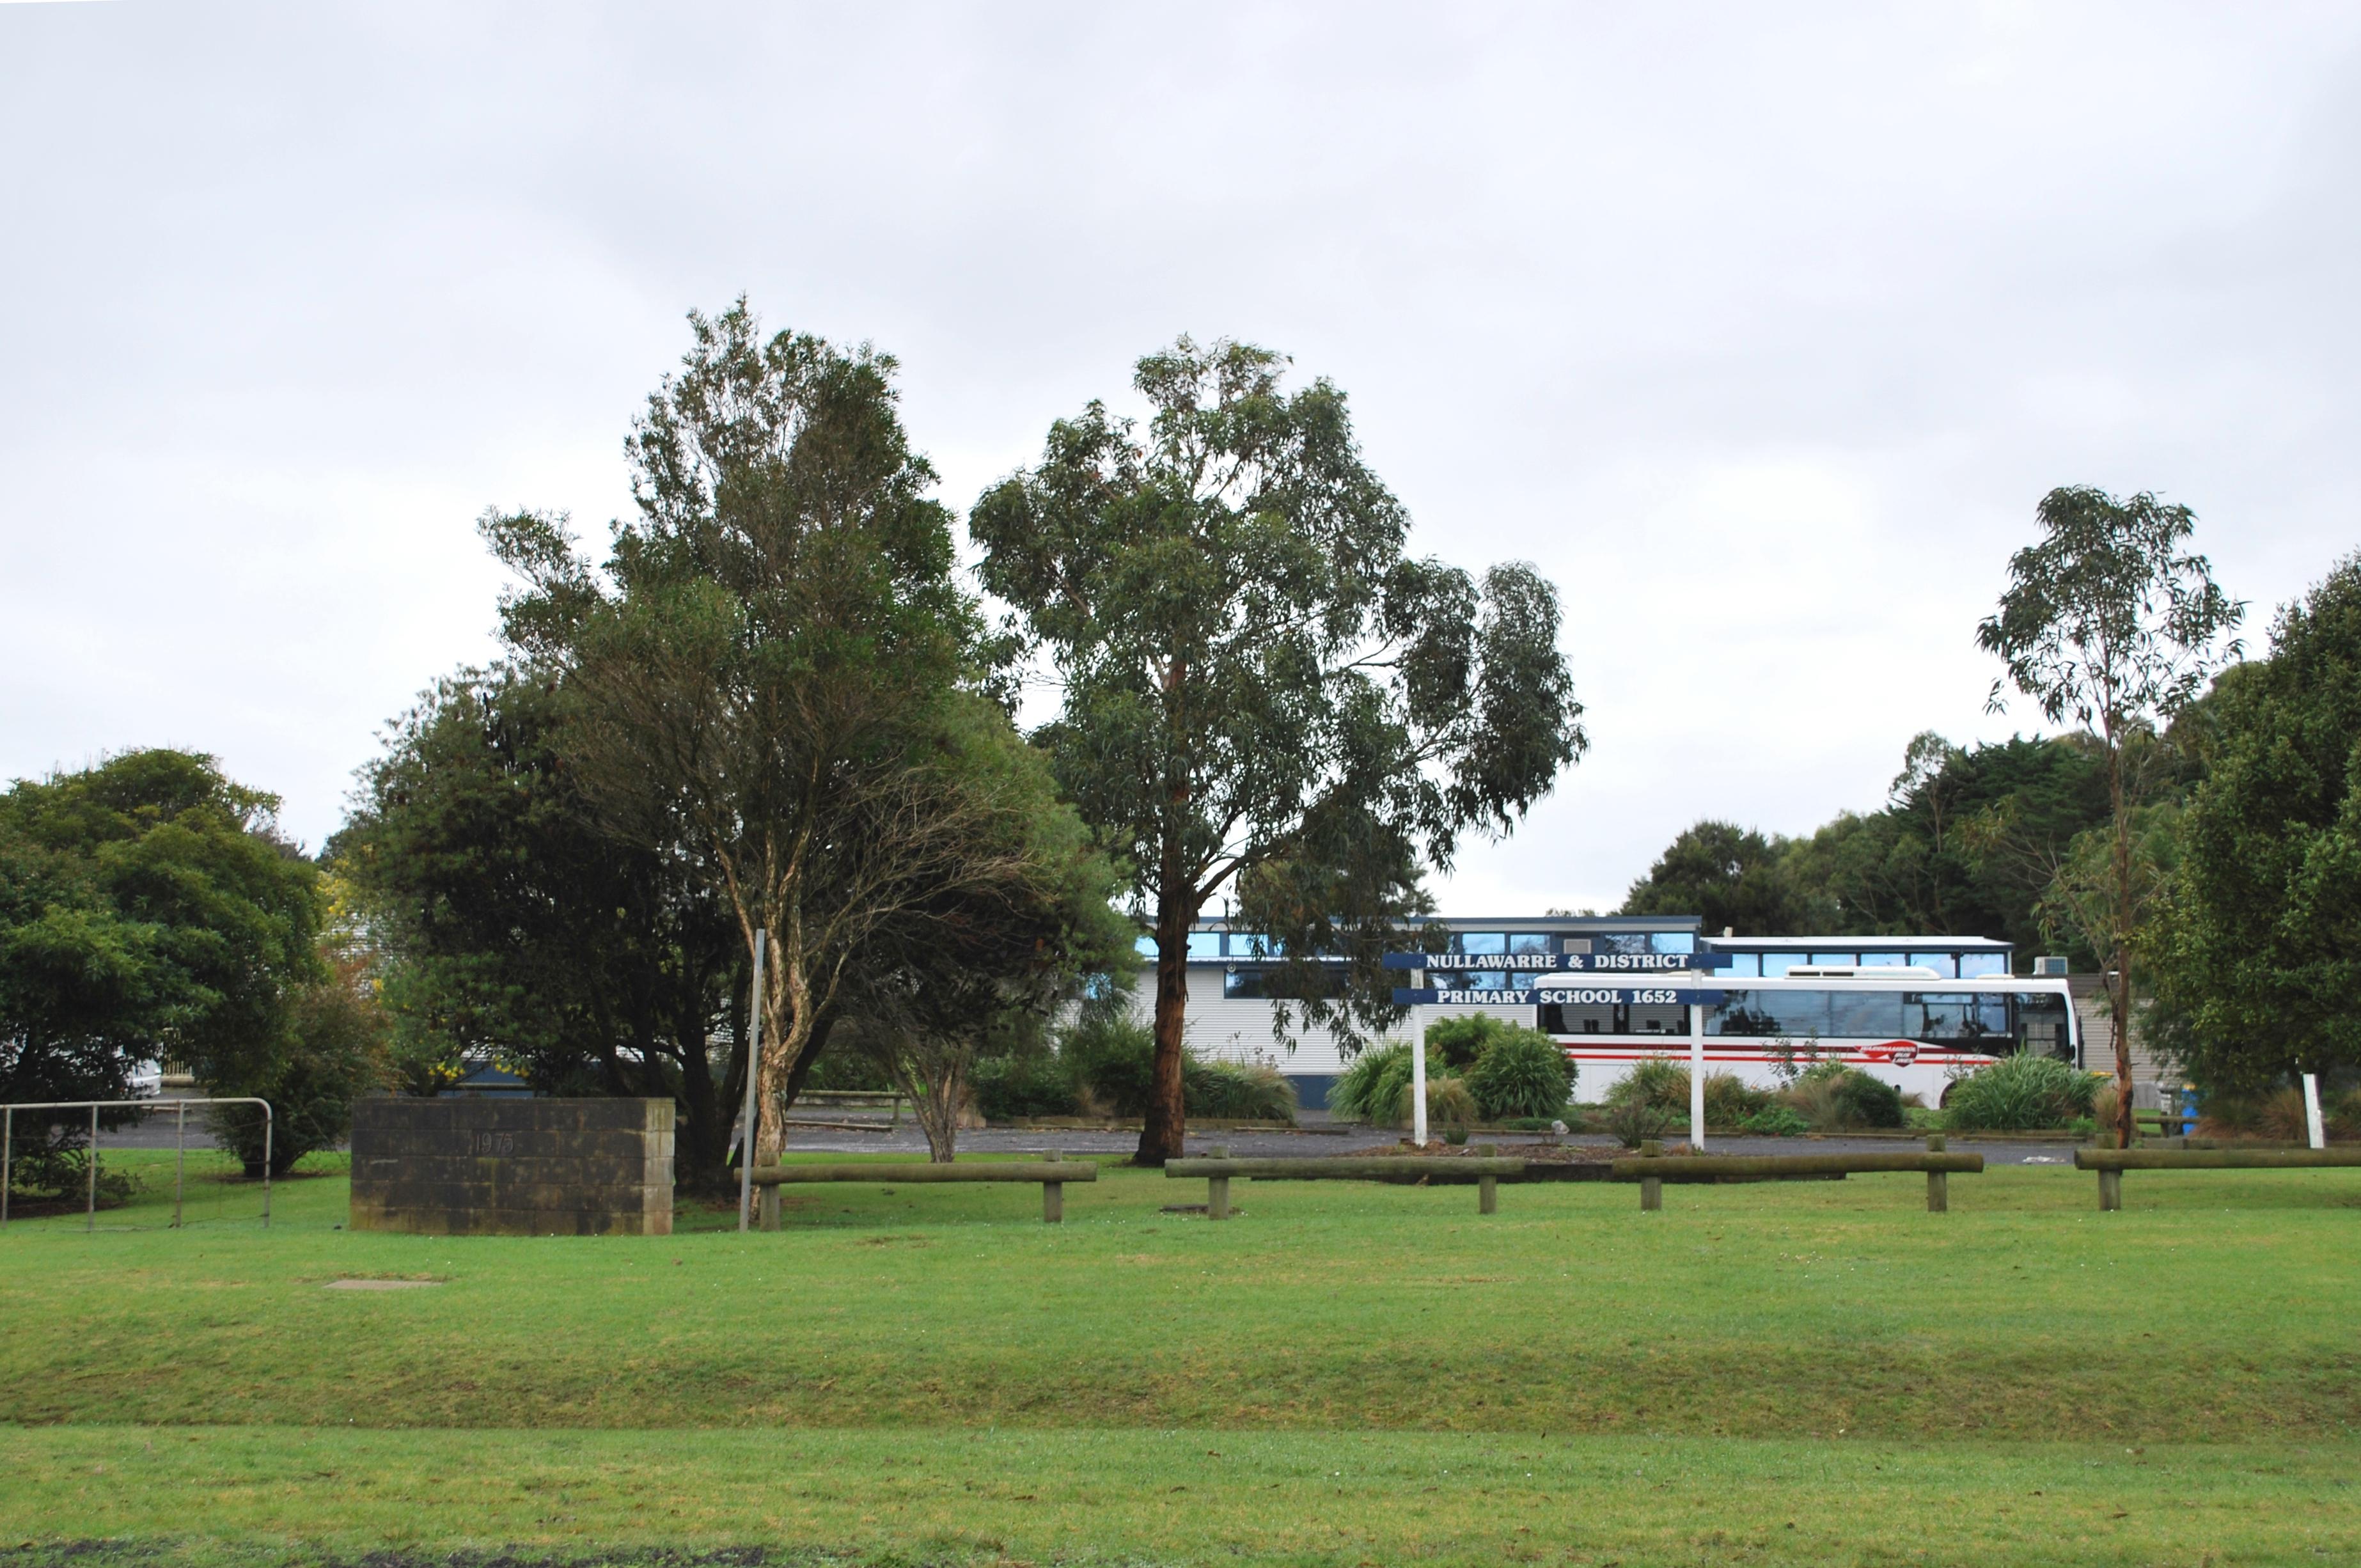 District 6 School House